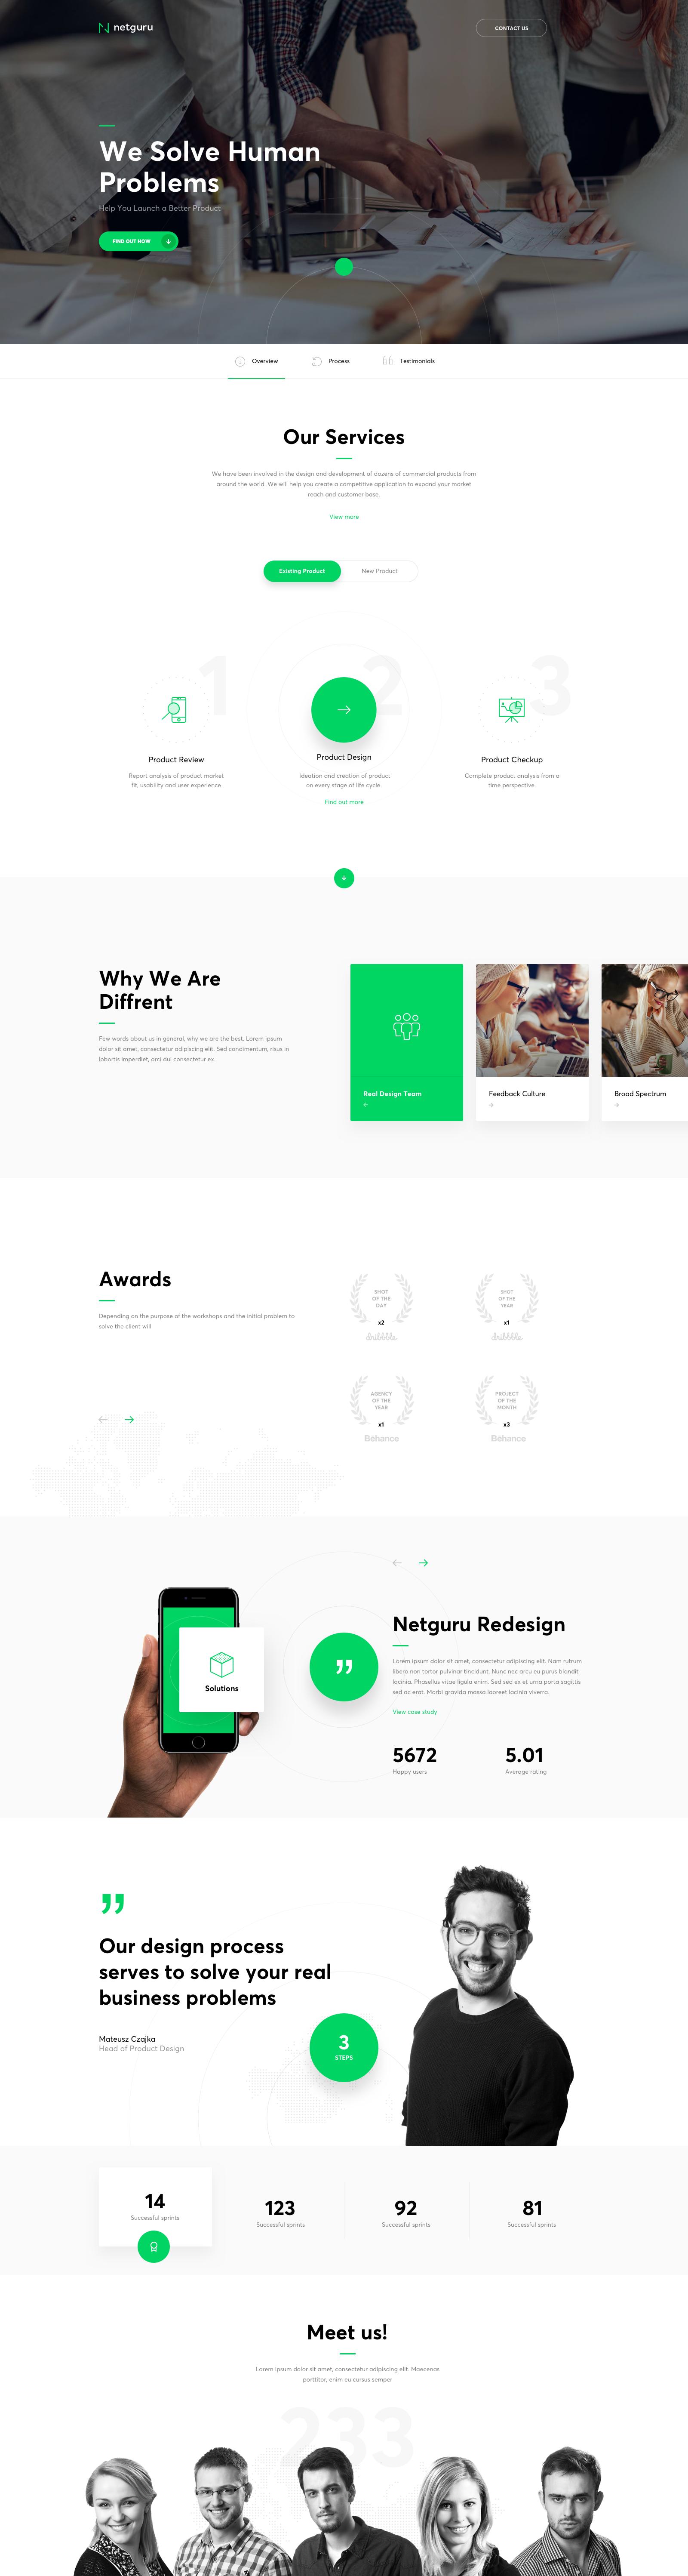 Productdesign full